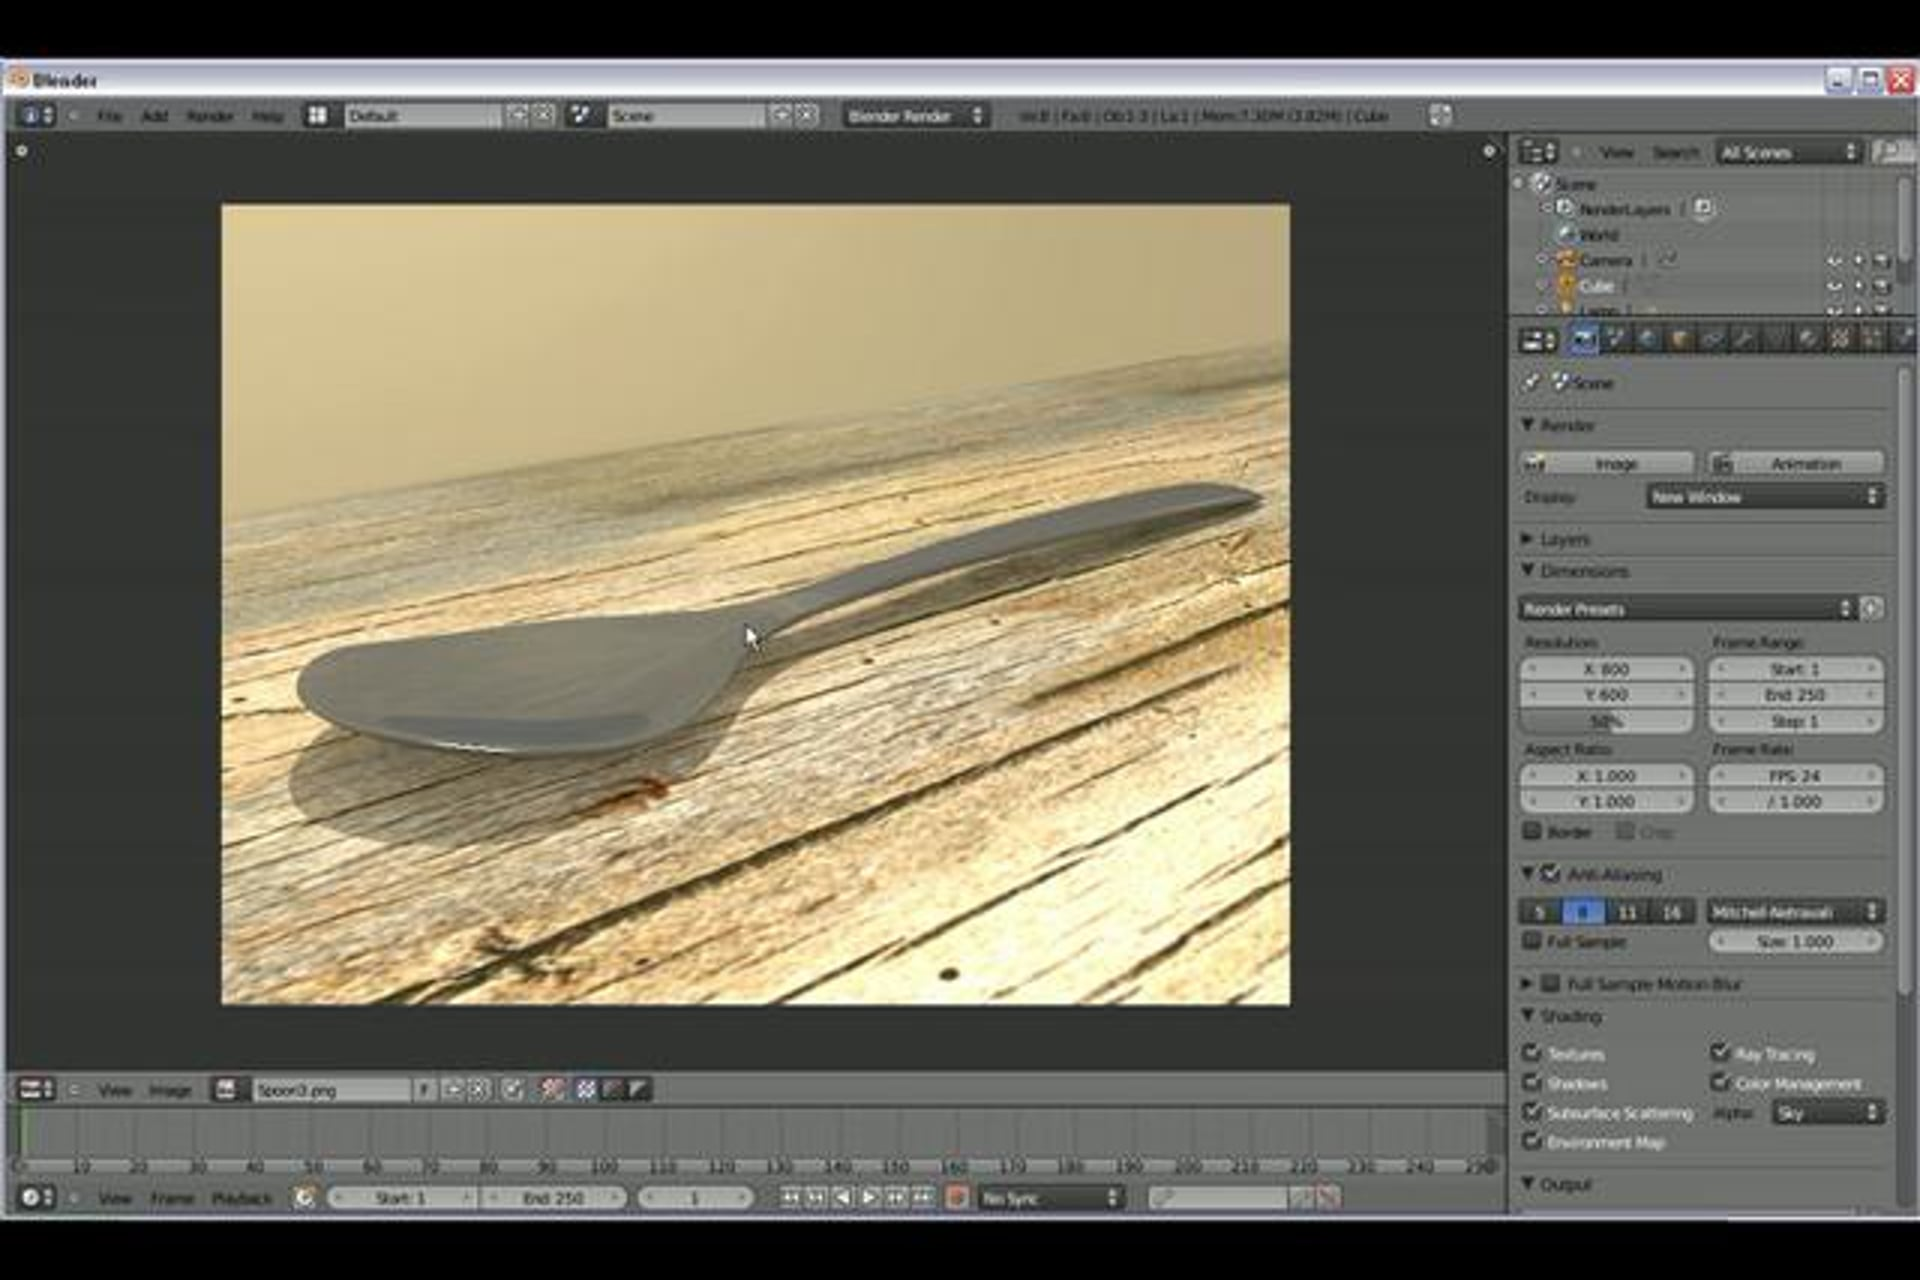 modeling-a-spoon-in-blender-2-5.jpg